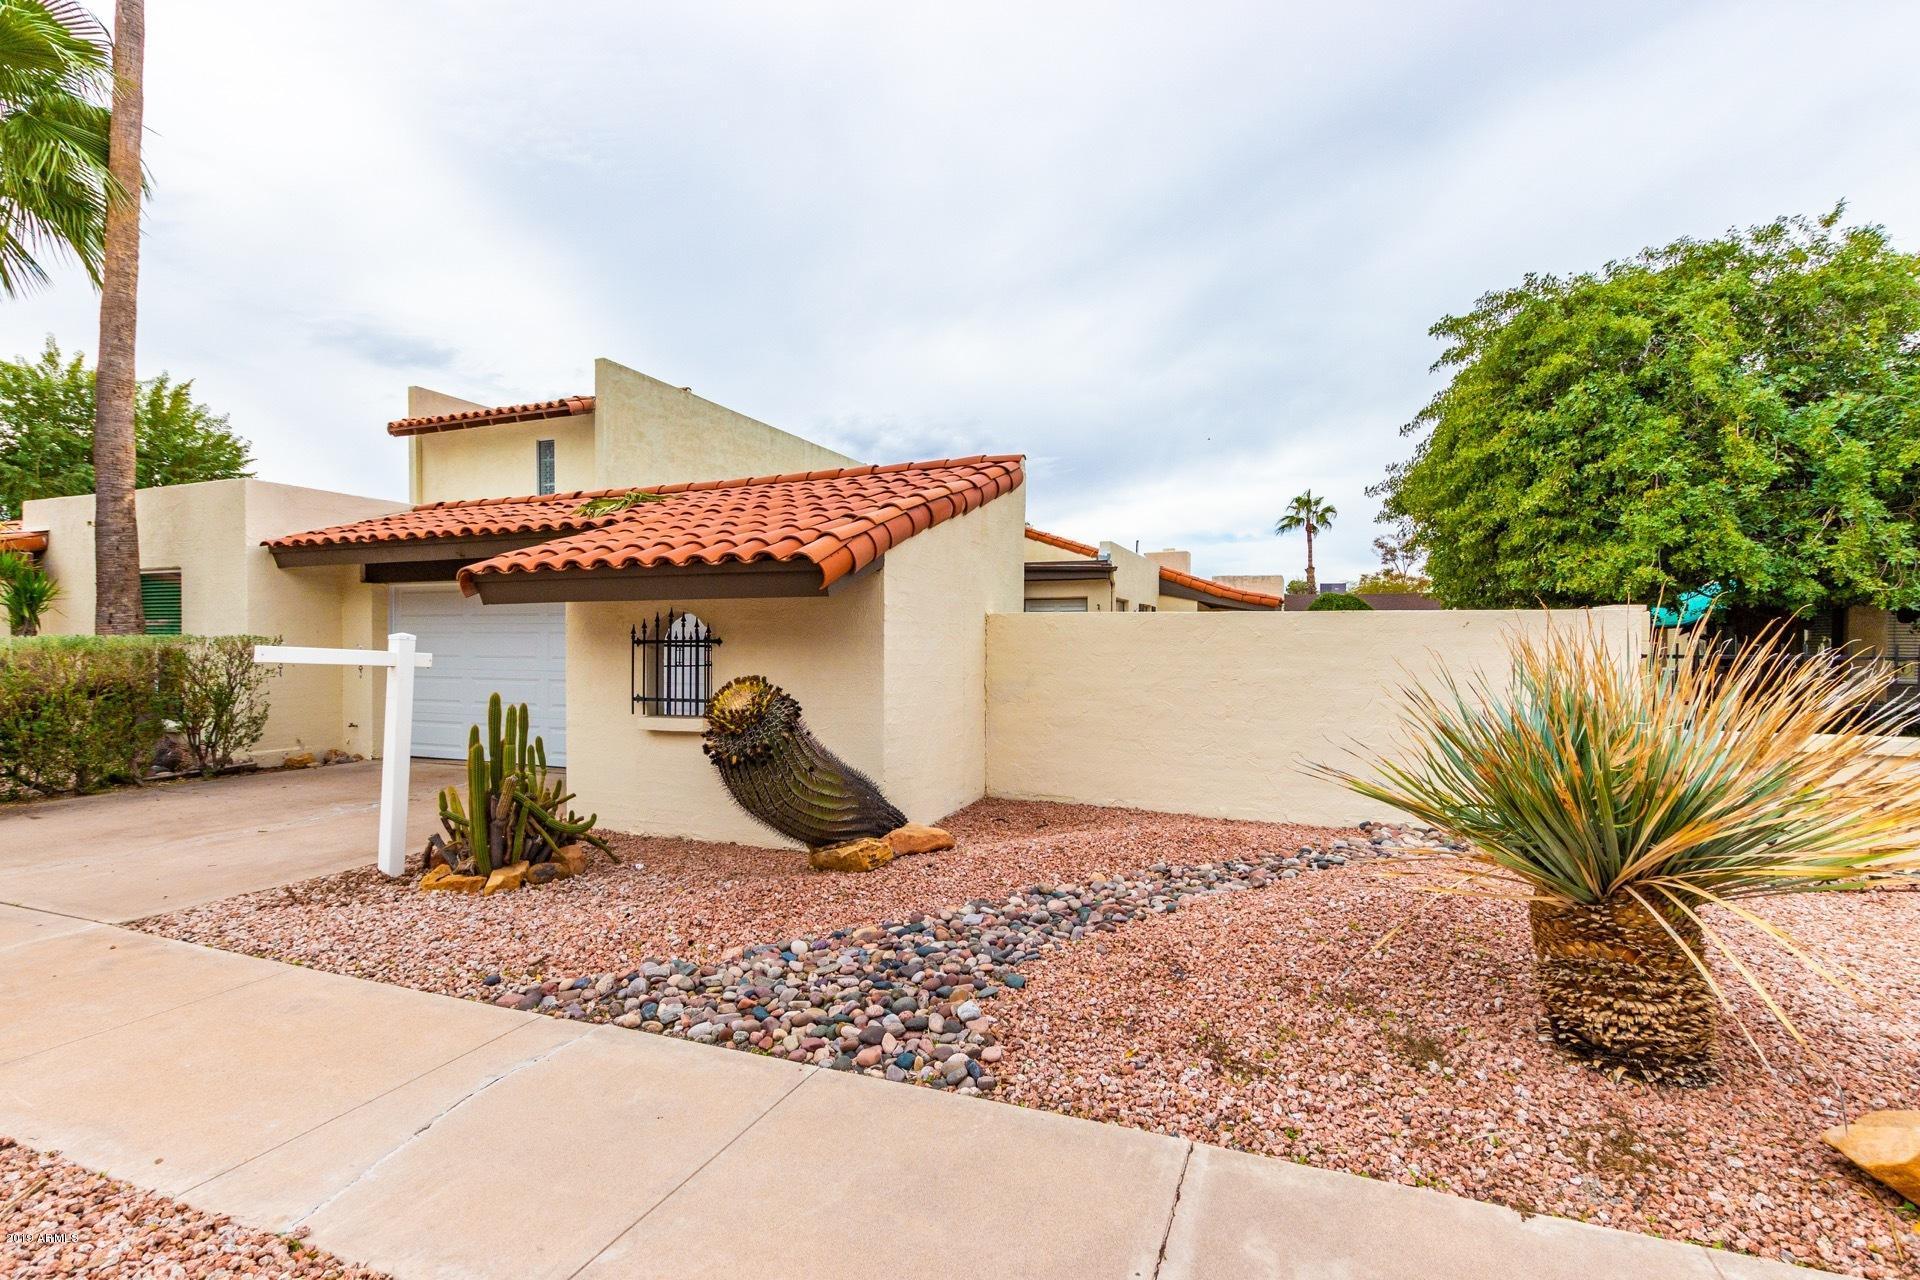 Photo of 1500 N Markdale Street #65, Mesa, AZ 85201